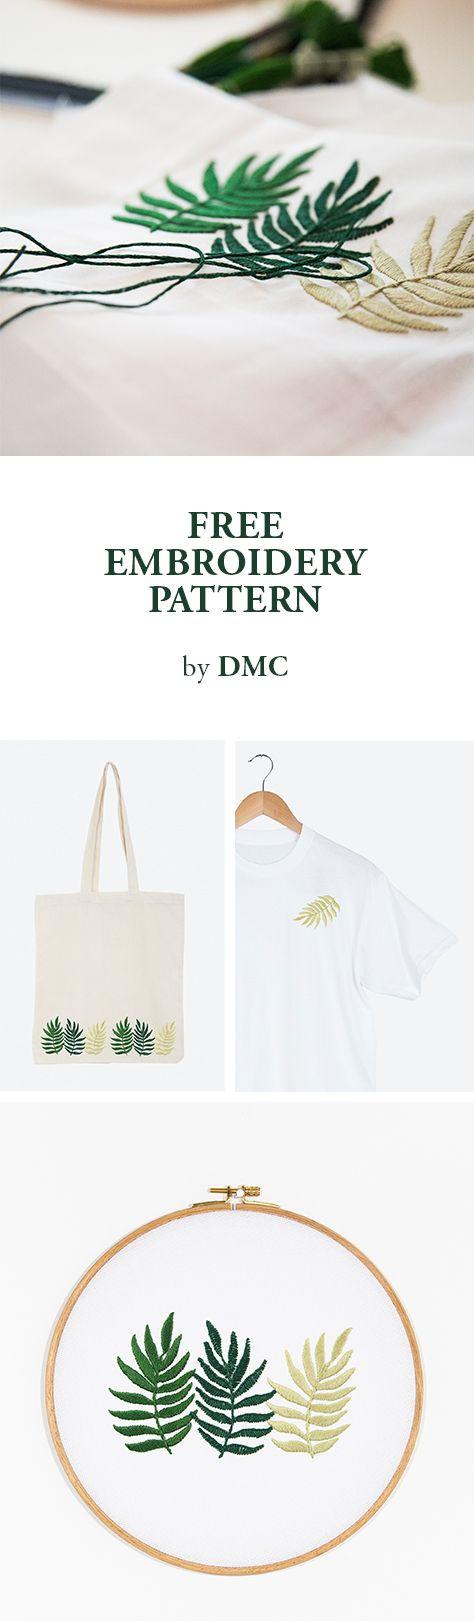 FREE EMBROIDERY PATTERN by DMC. | homeschool | Pinterest | Bordado ...